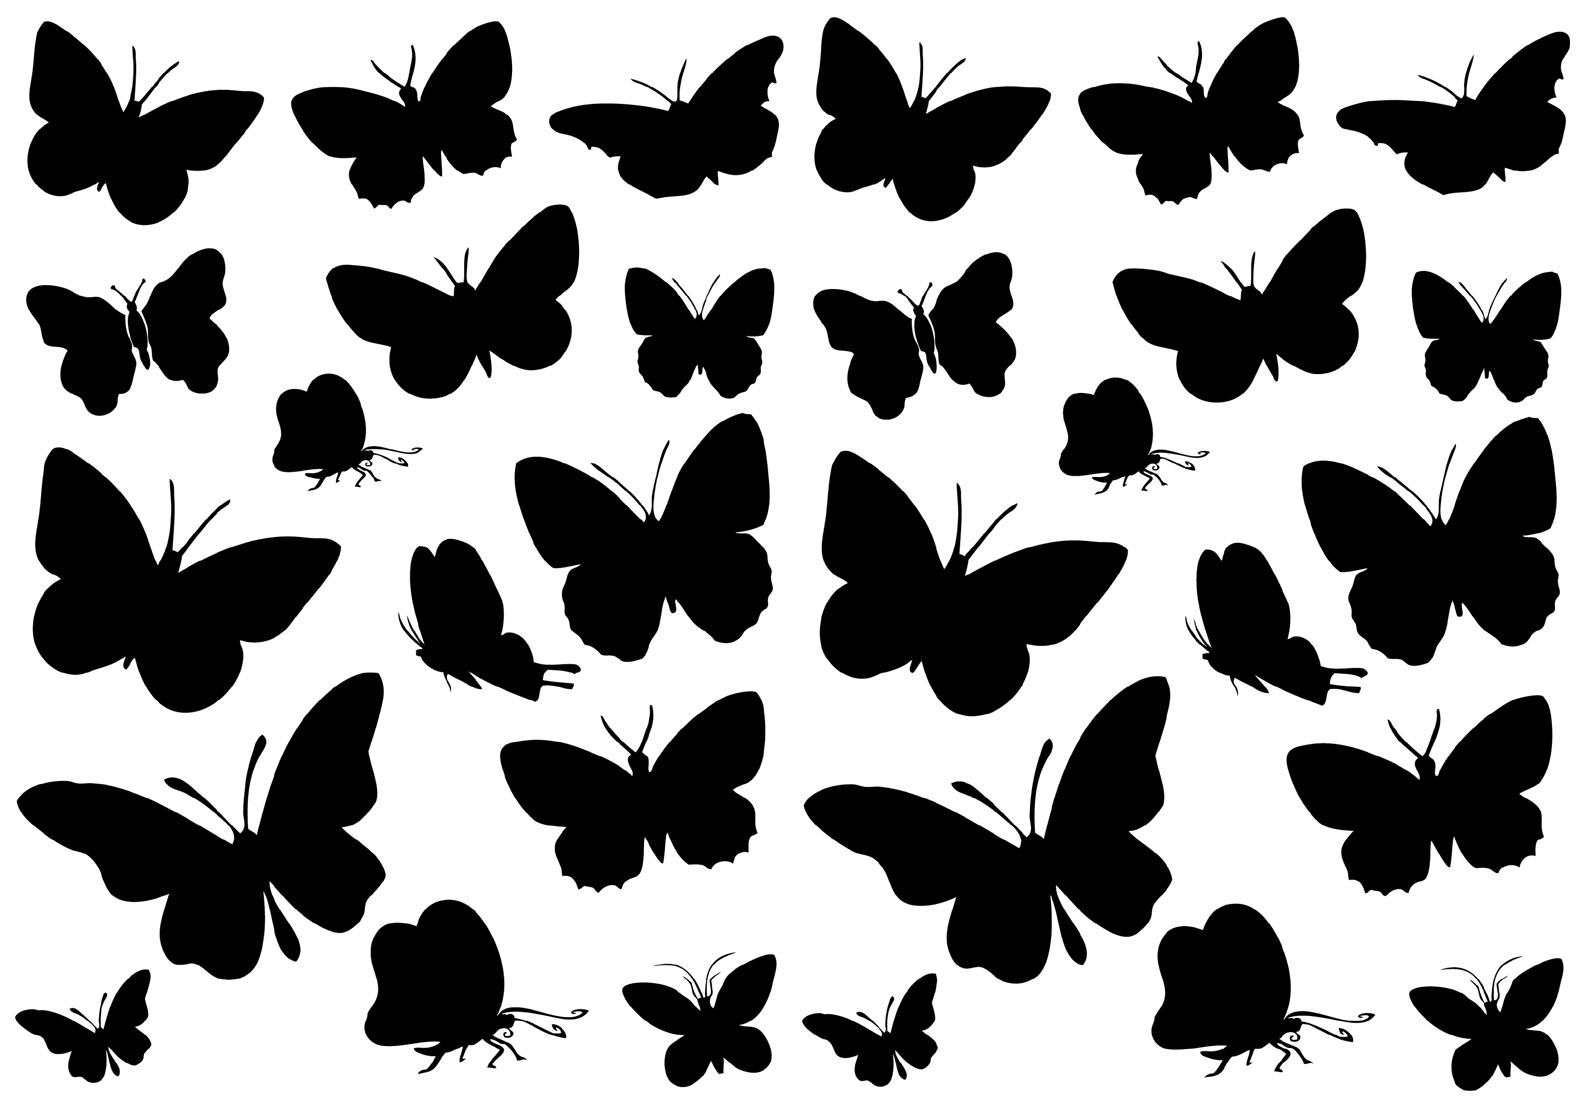 kit 30 stickers papillon pas cher. Black Bedroom Furniture Sets. Home Design Ideas